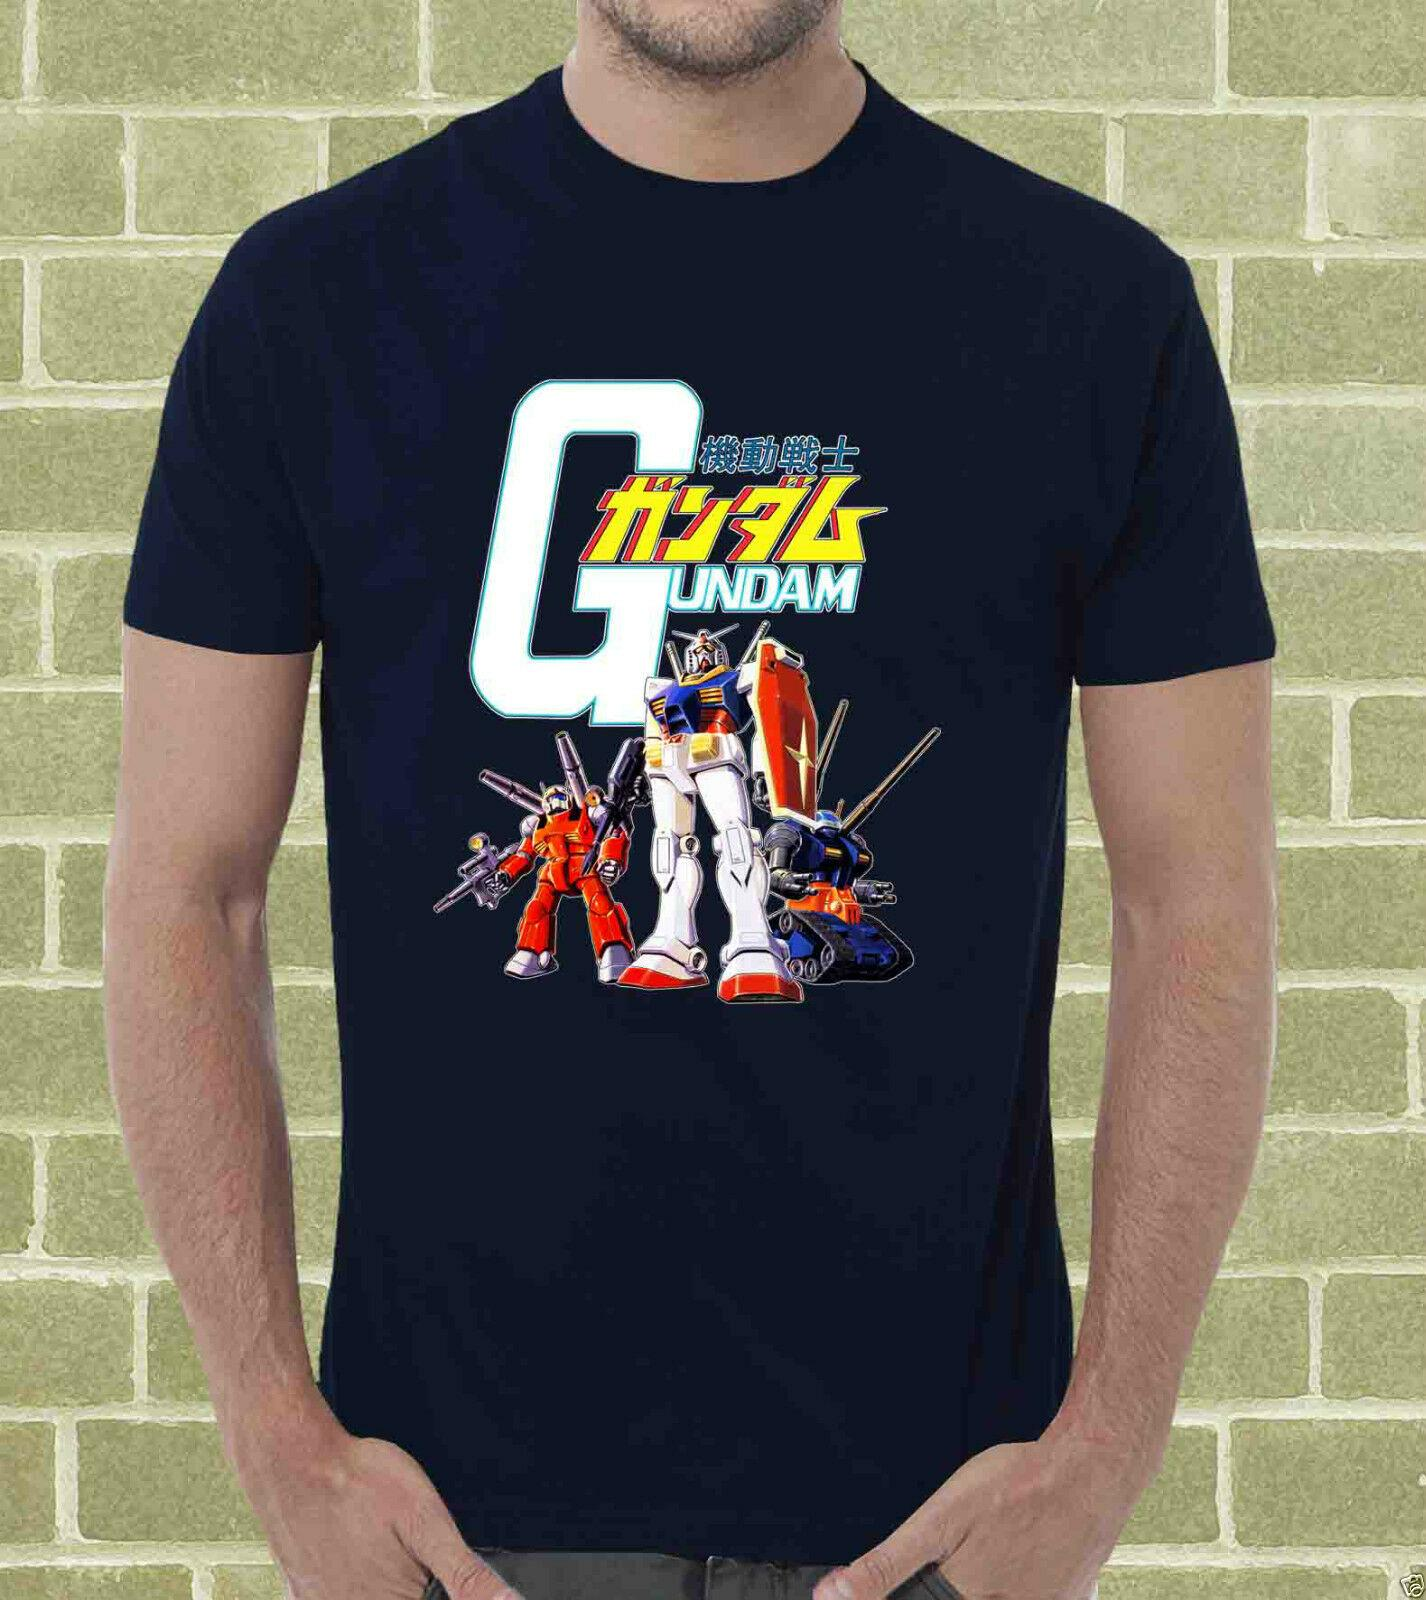 T Uomo 80 E Divertente Cartoon Gundam Acquista Shirt Bambino Anni trCxshQd